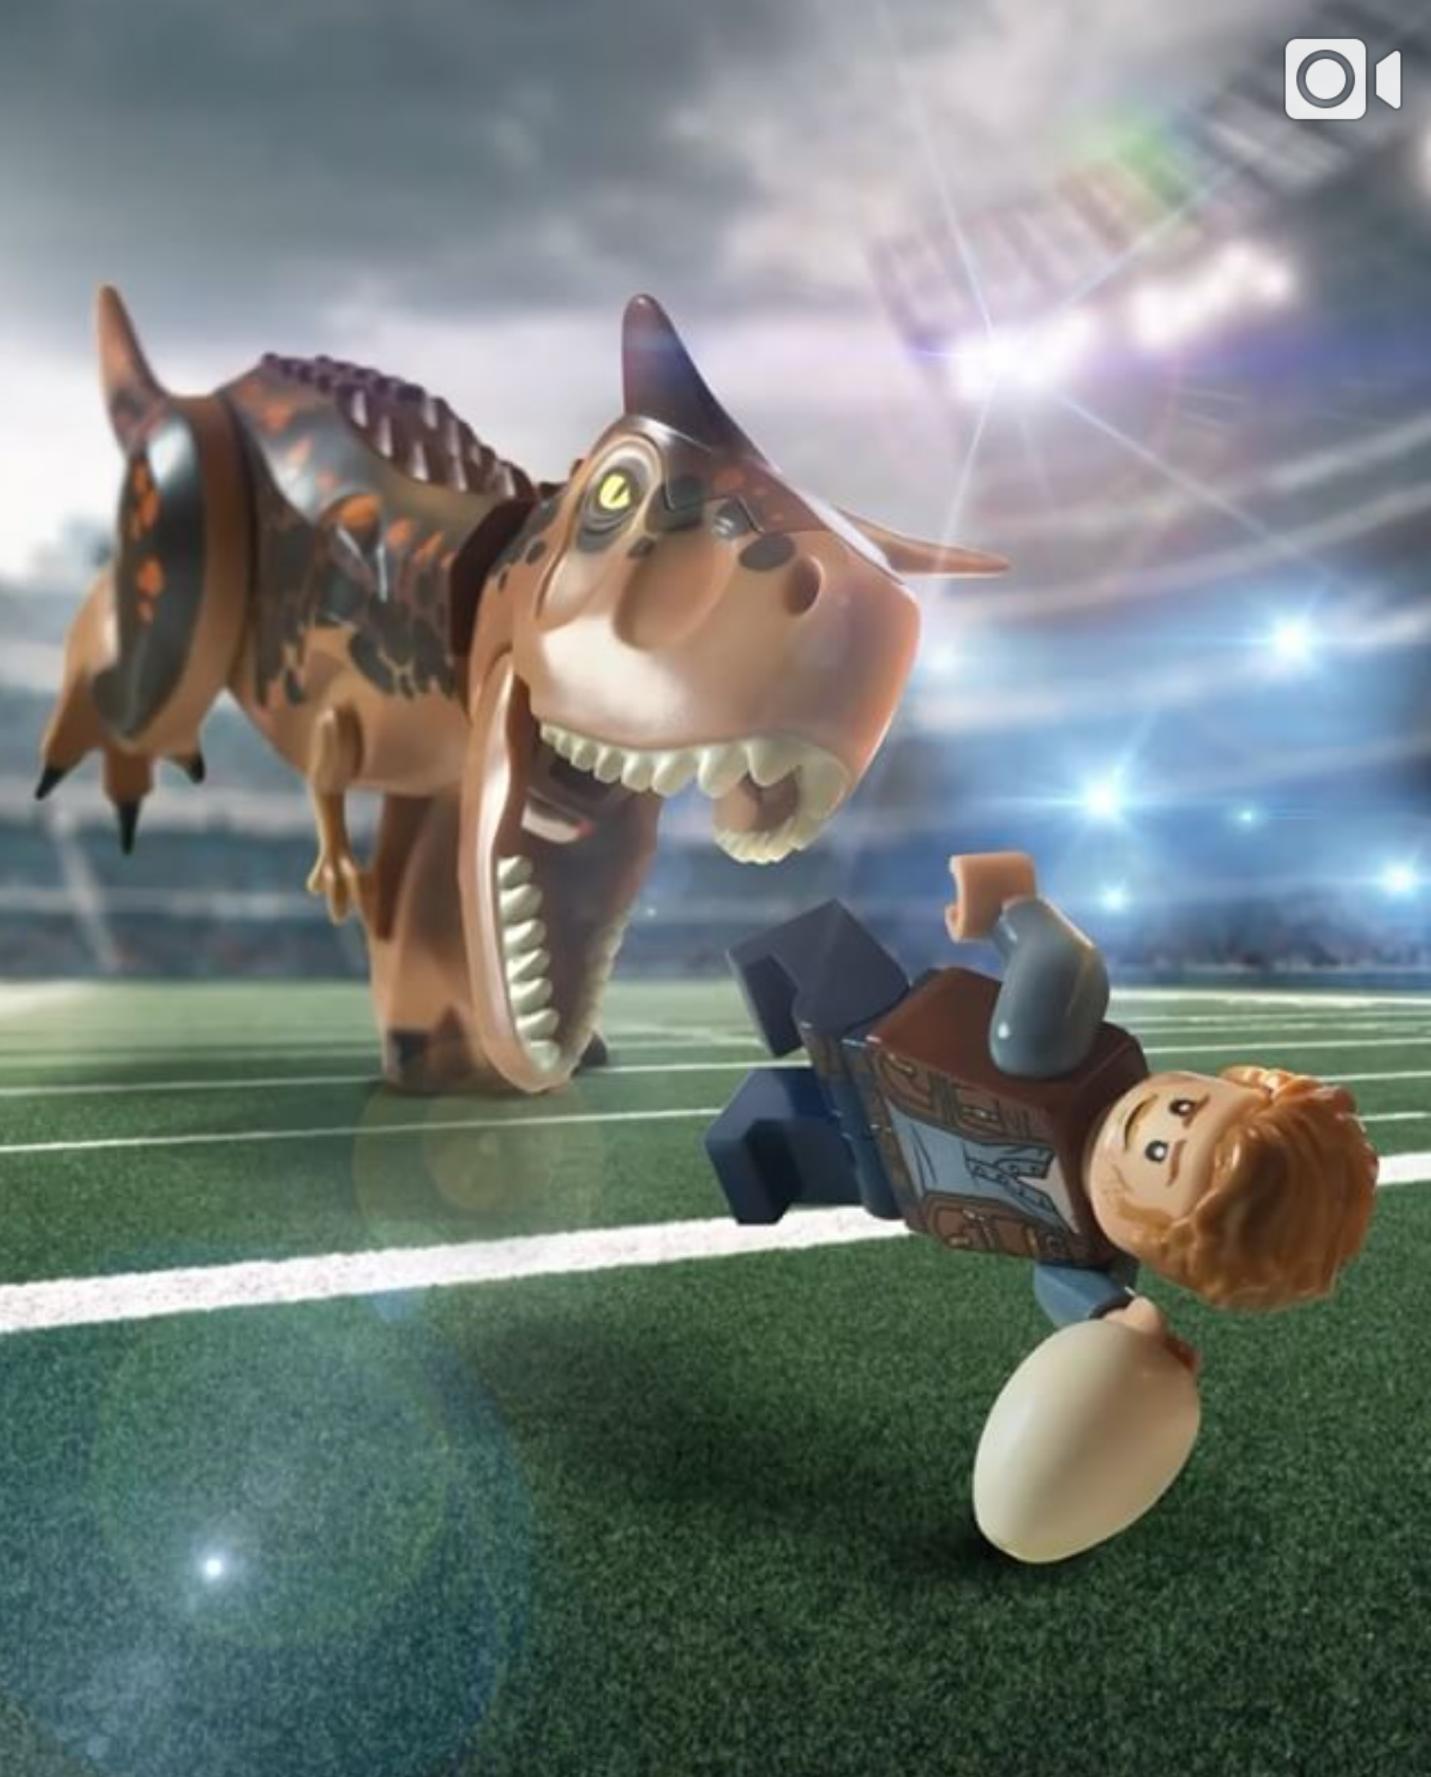 Preview Lego Jurassic World 2018 Fallen Kingdom Sets Jays